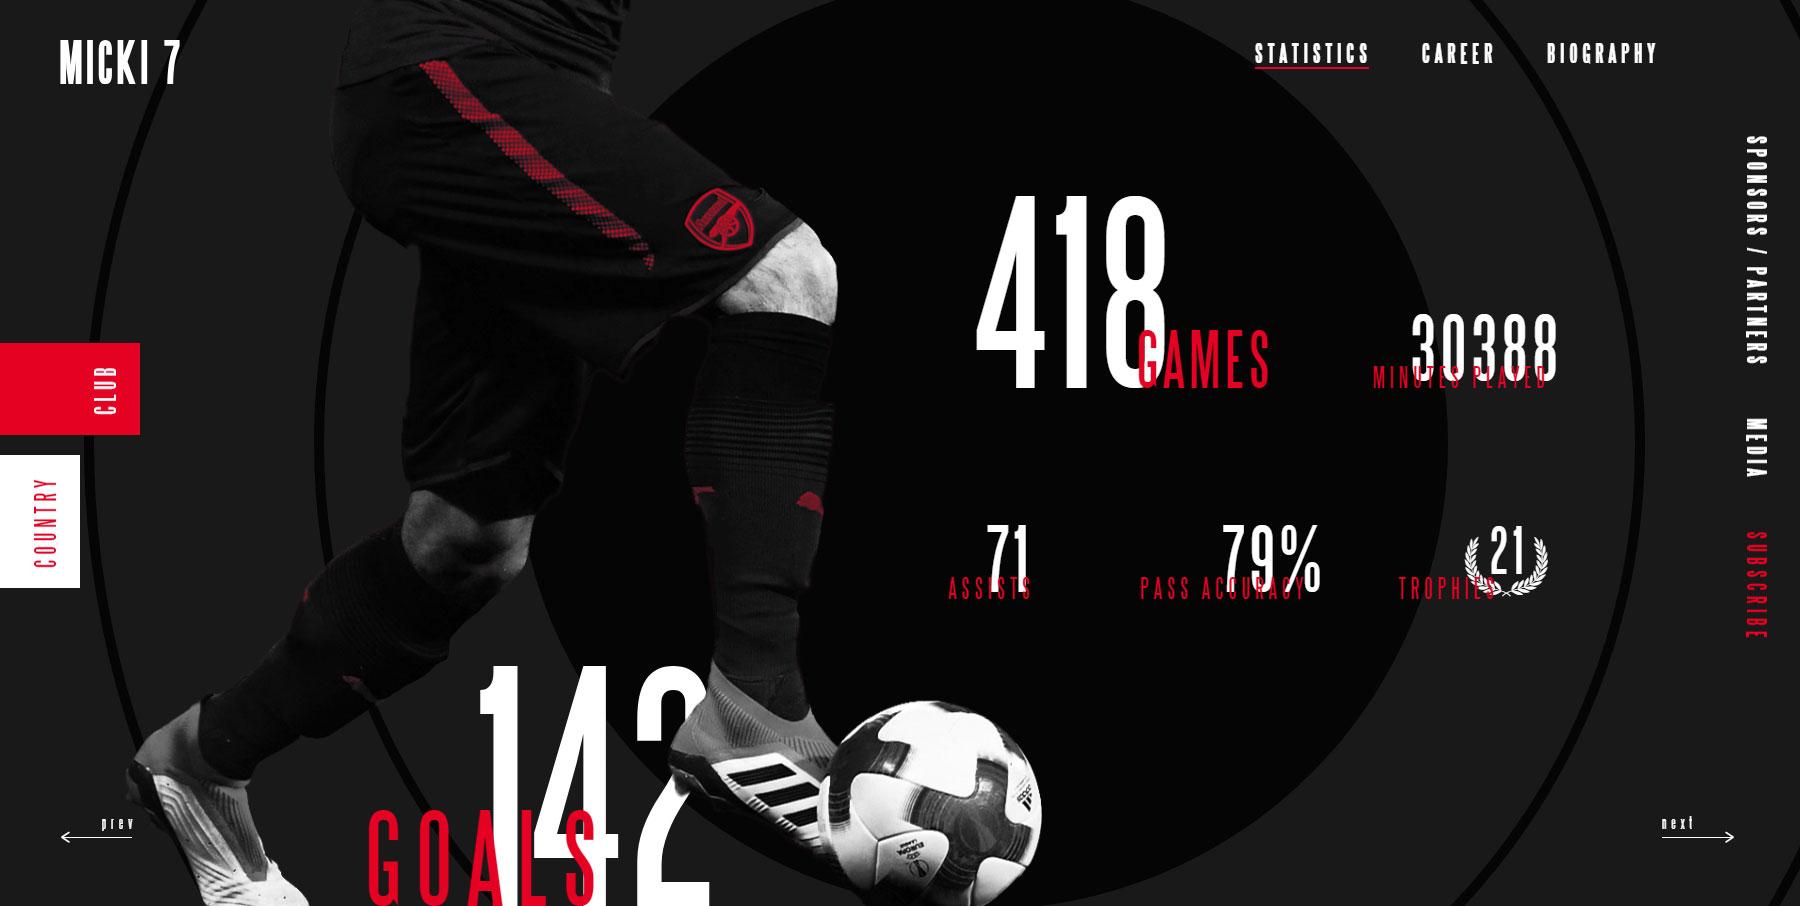 Henrikh Mkhitaryan Official Website - Website of the Day